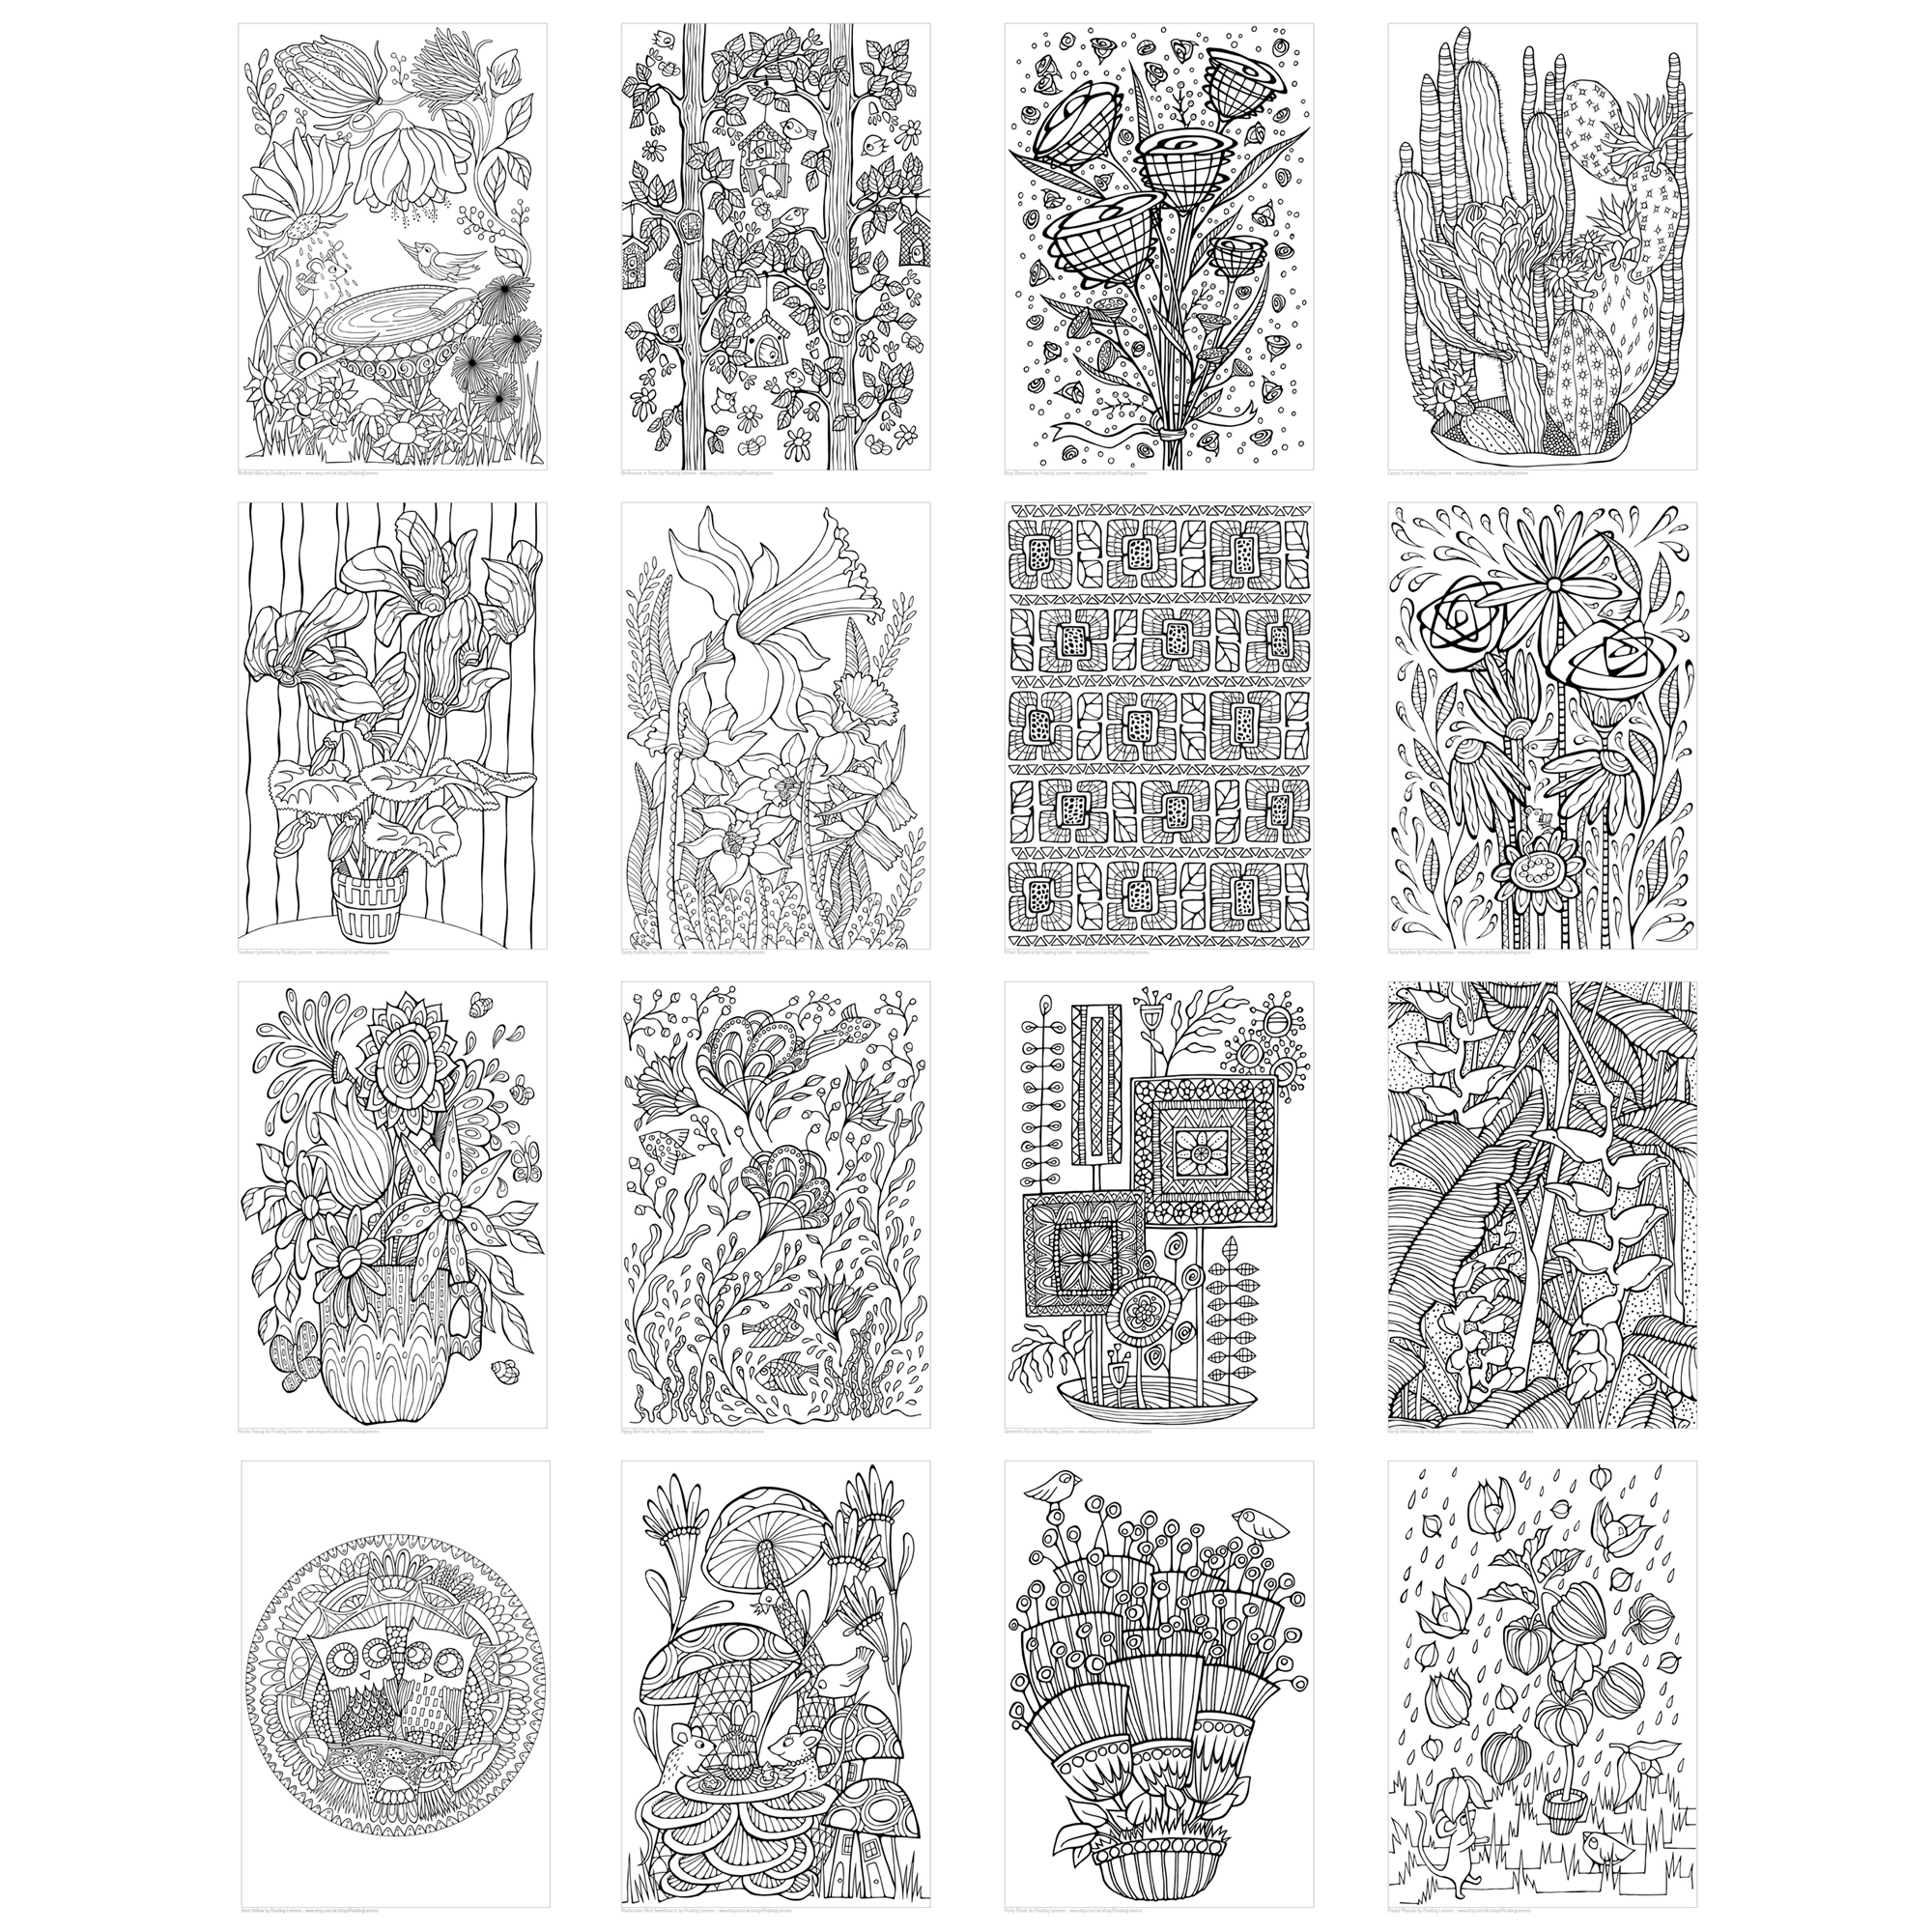 QB-Thumbnails-1.jpg